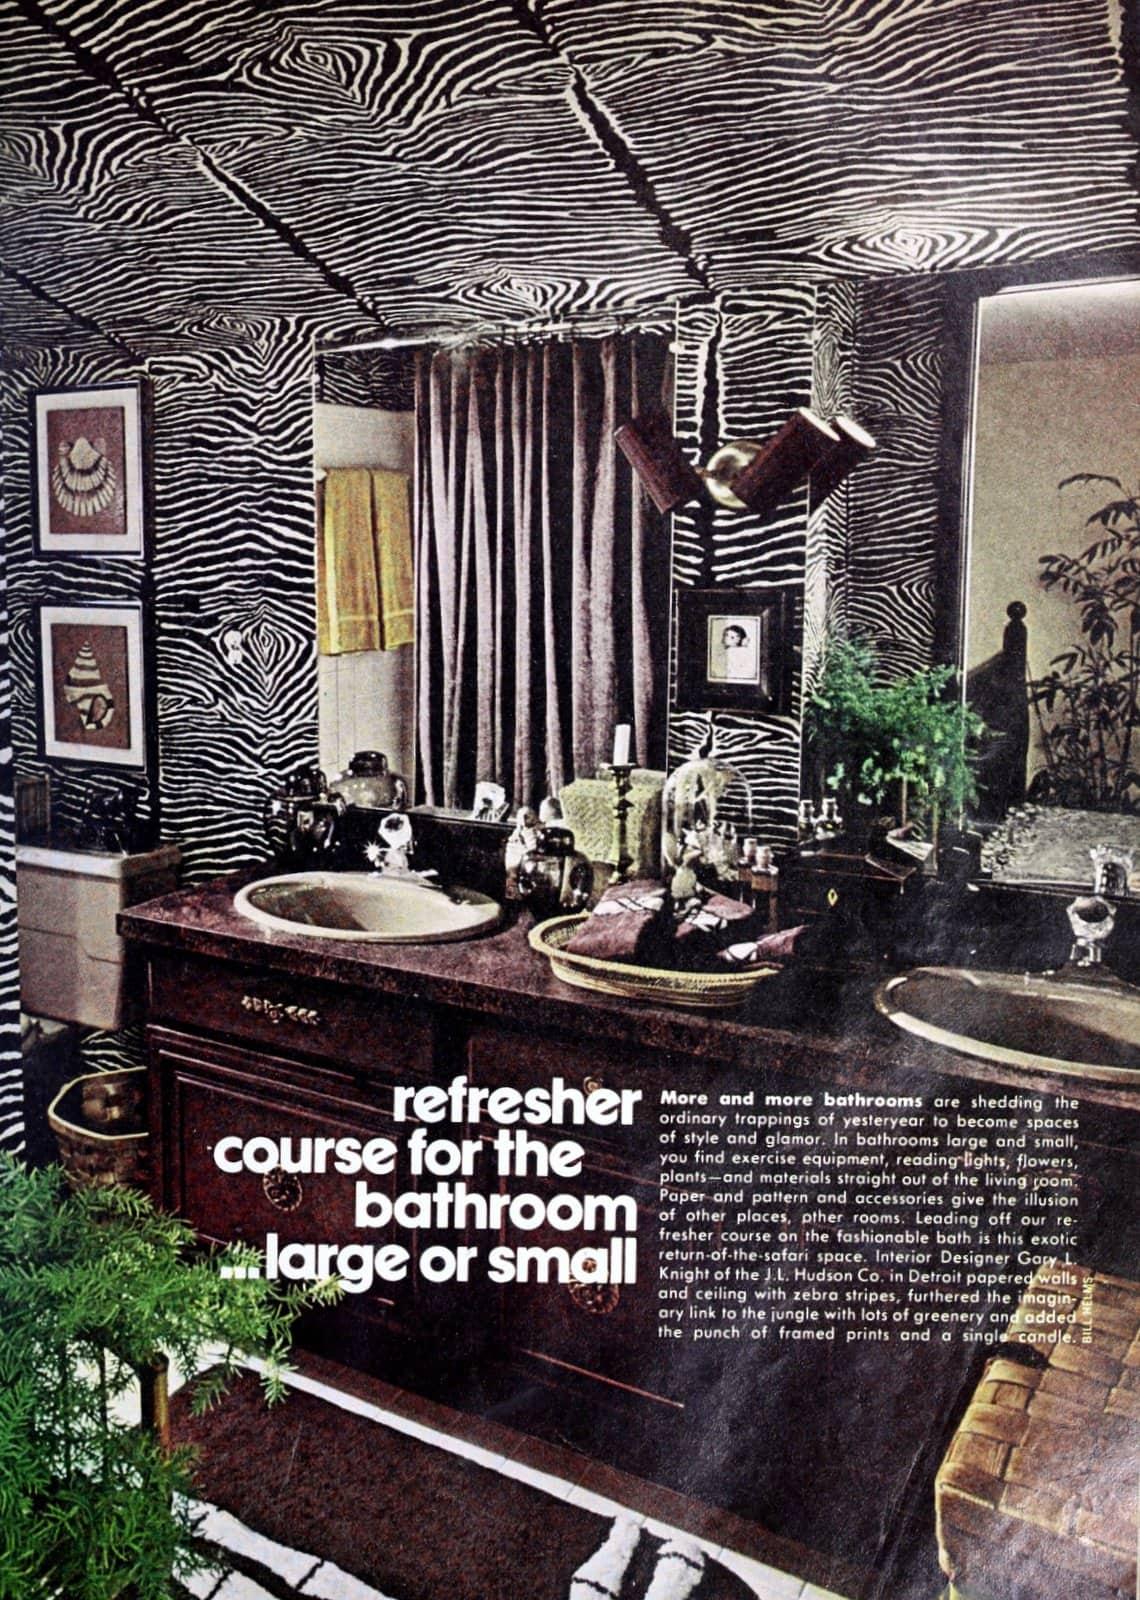 Retro 1970s bathroom with black and white tiger stripe - zebra stripe patterned walls